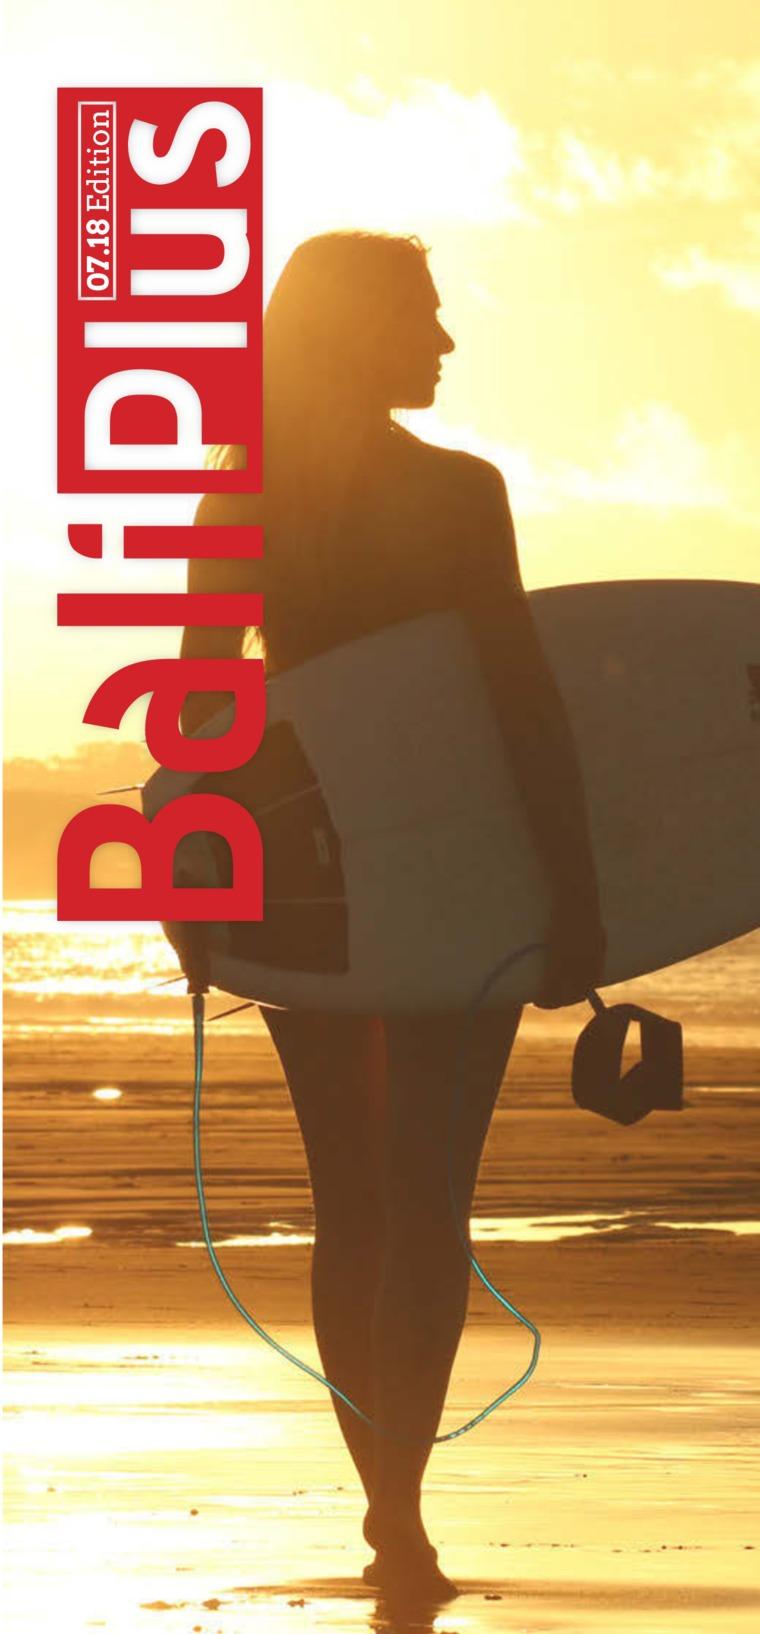 BALI PLUS Digital Magazine July 2018